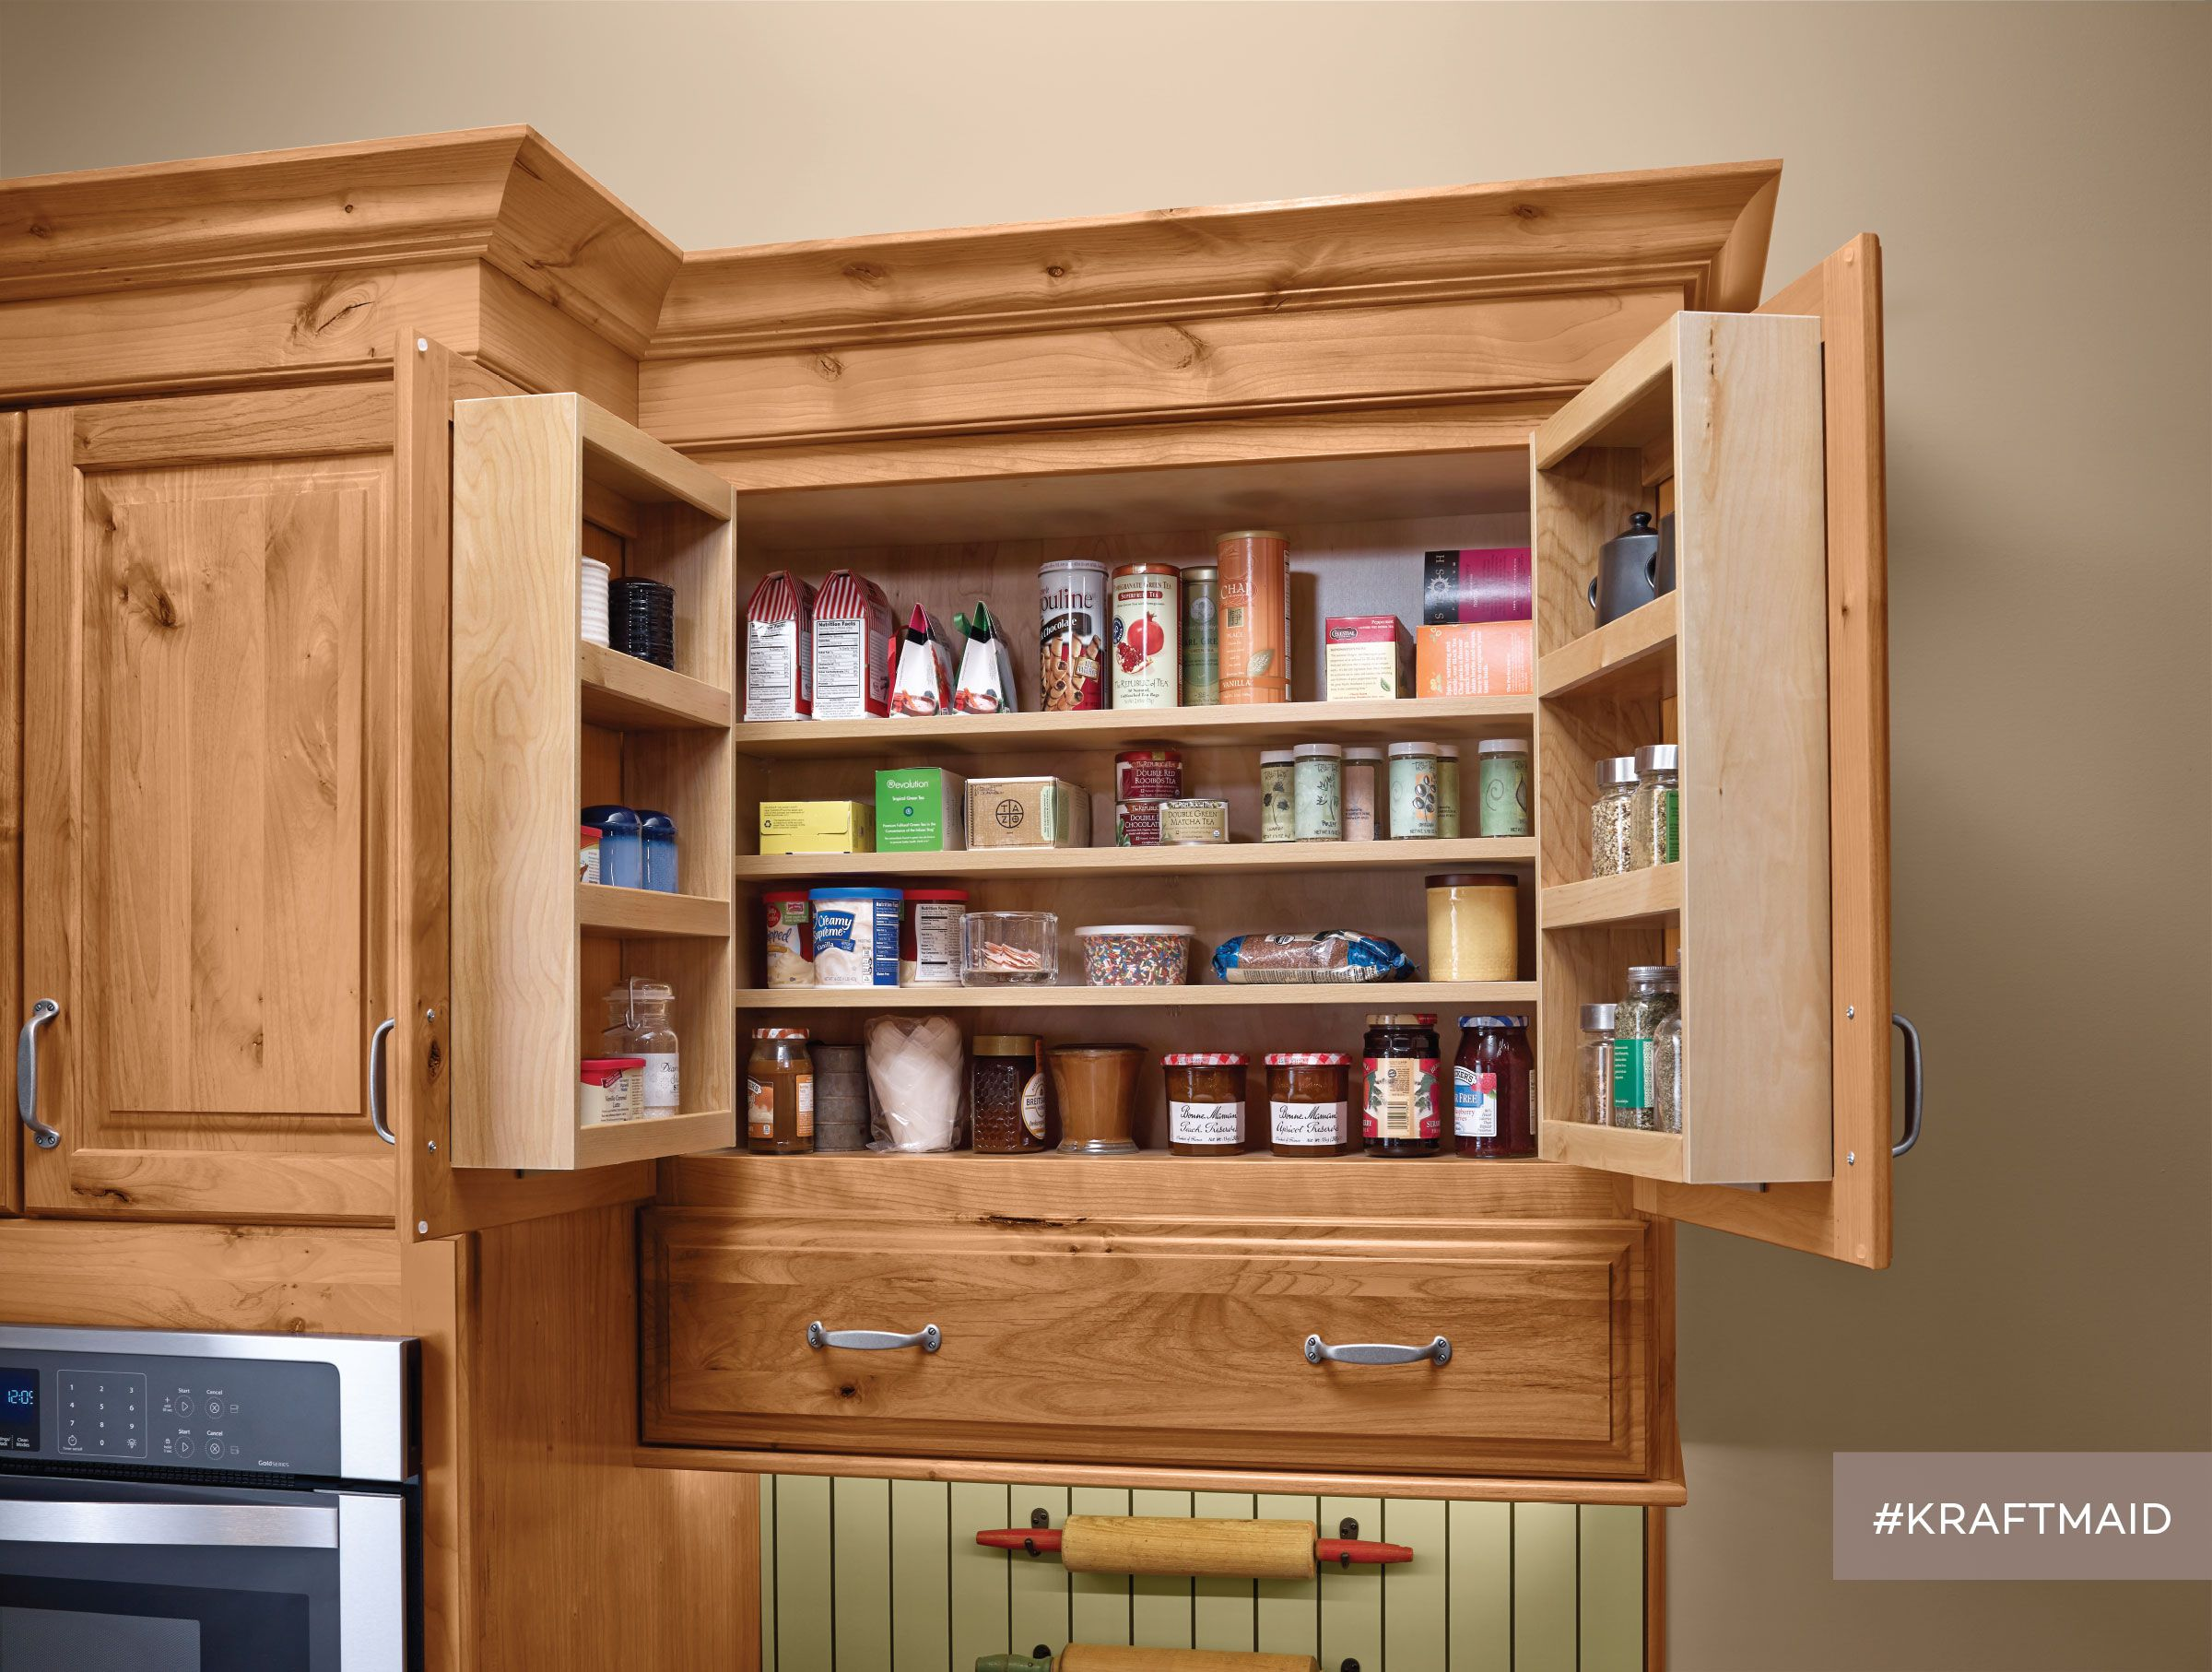 wall multi storage pantry kitchen pantry cabinets kitchen cabinet design kraftmaid cabinets on kitchen organization cabinet layout id=90374